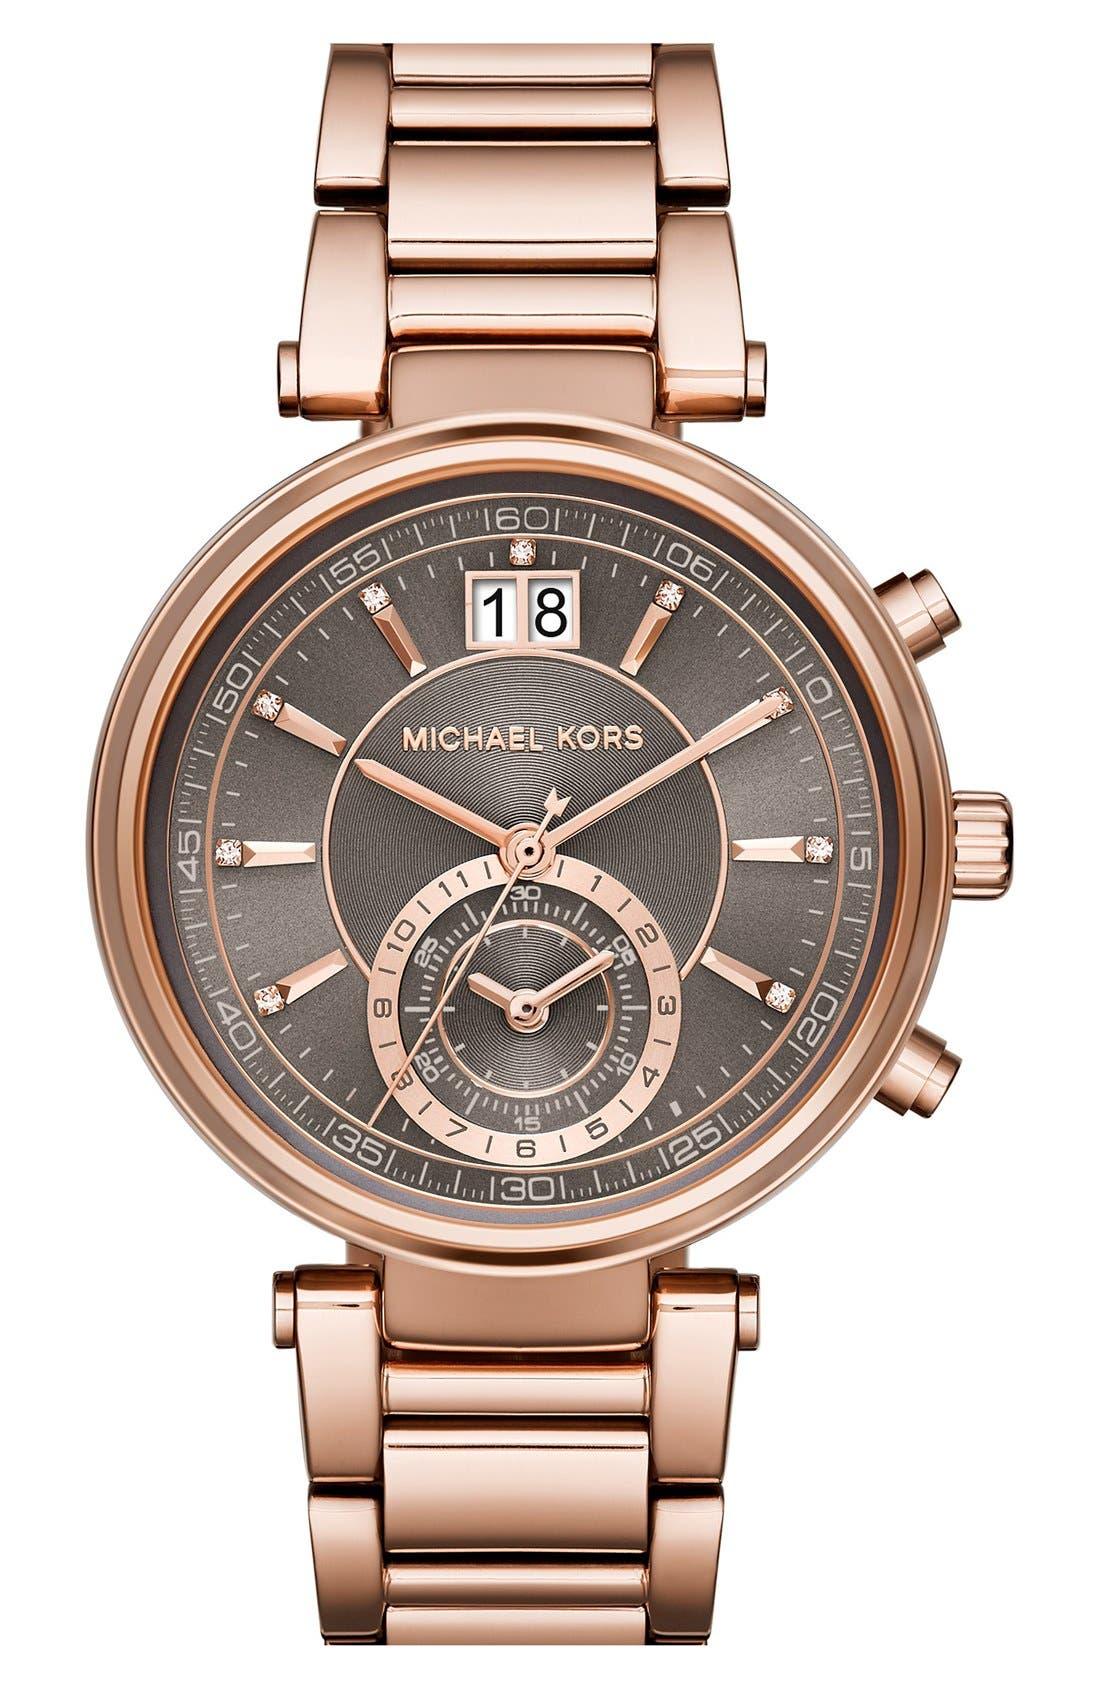 Main Image - Michael Kors 'Sawyer' Bracelet Watch, 39mm